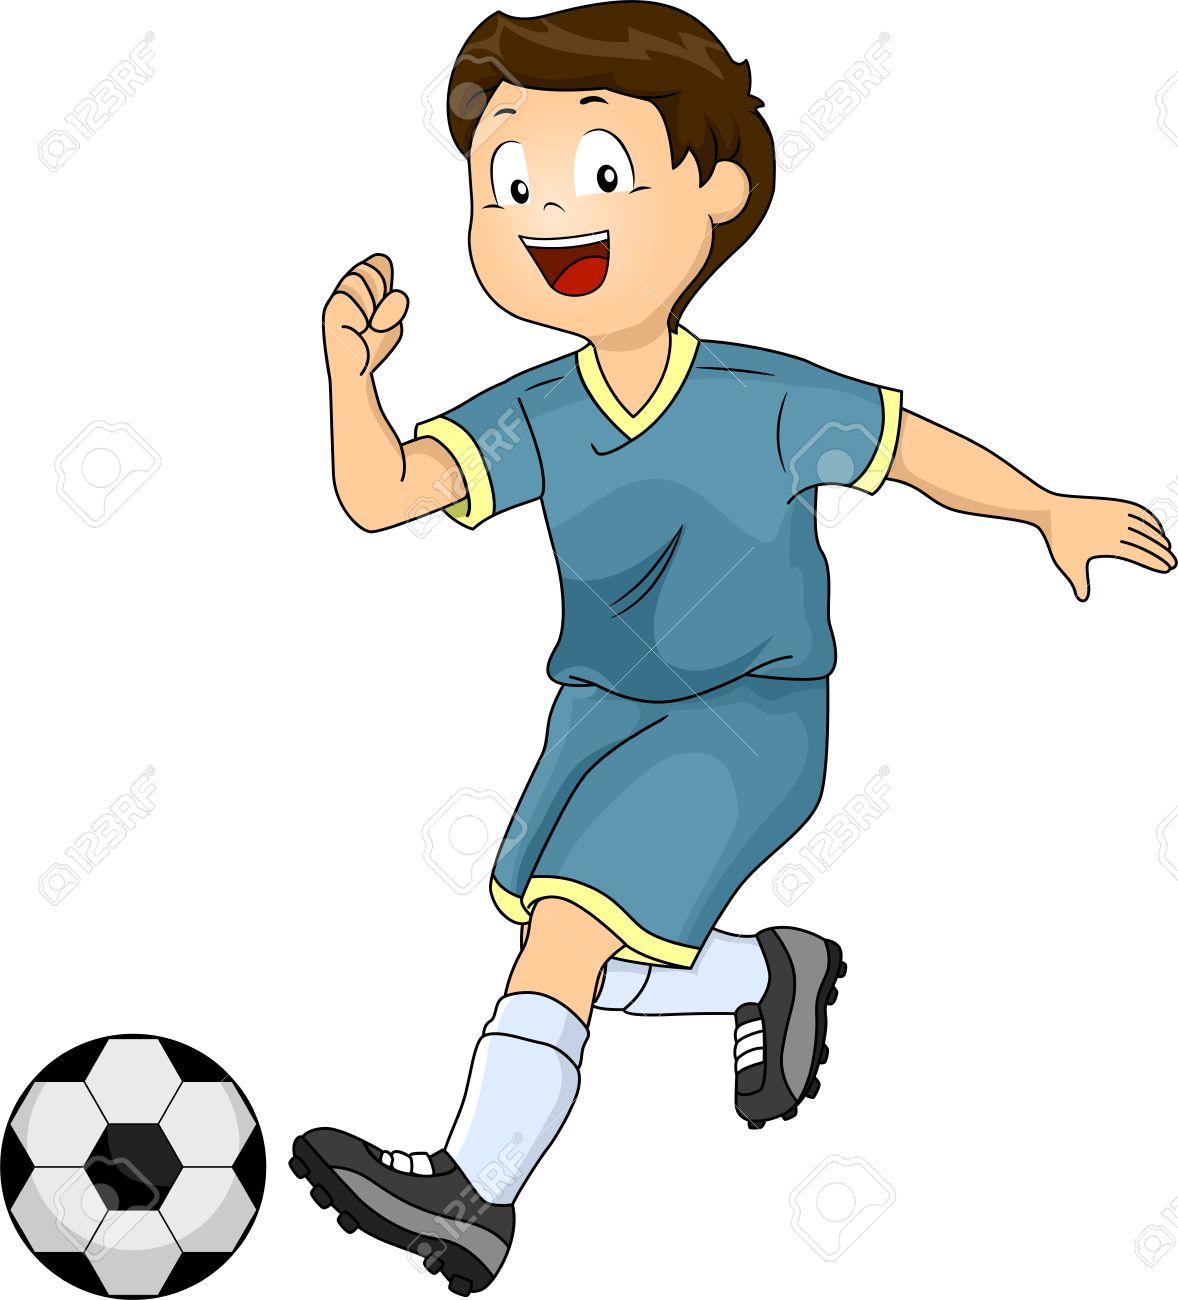 1178x1300 Illustration Of A Little Boy Kicking A Soccer Ball Stock Photo